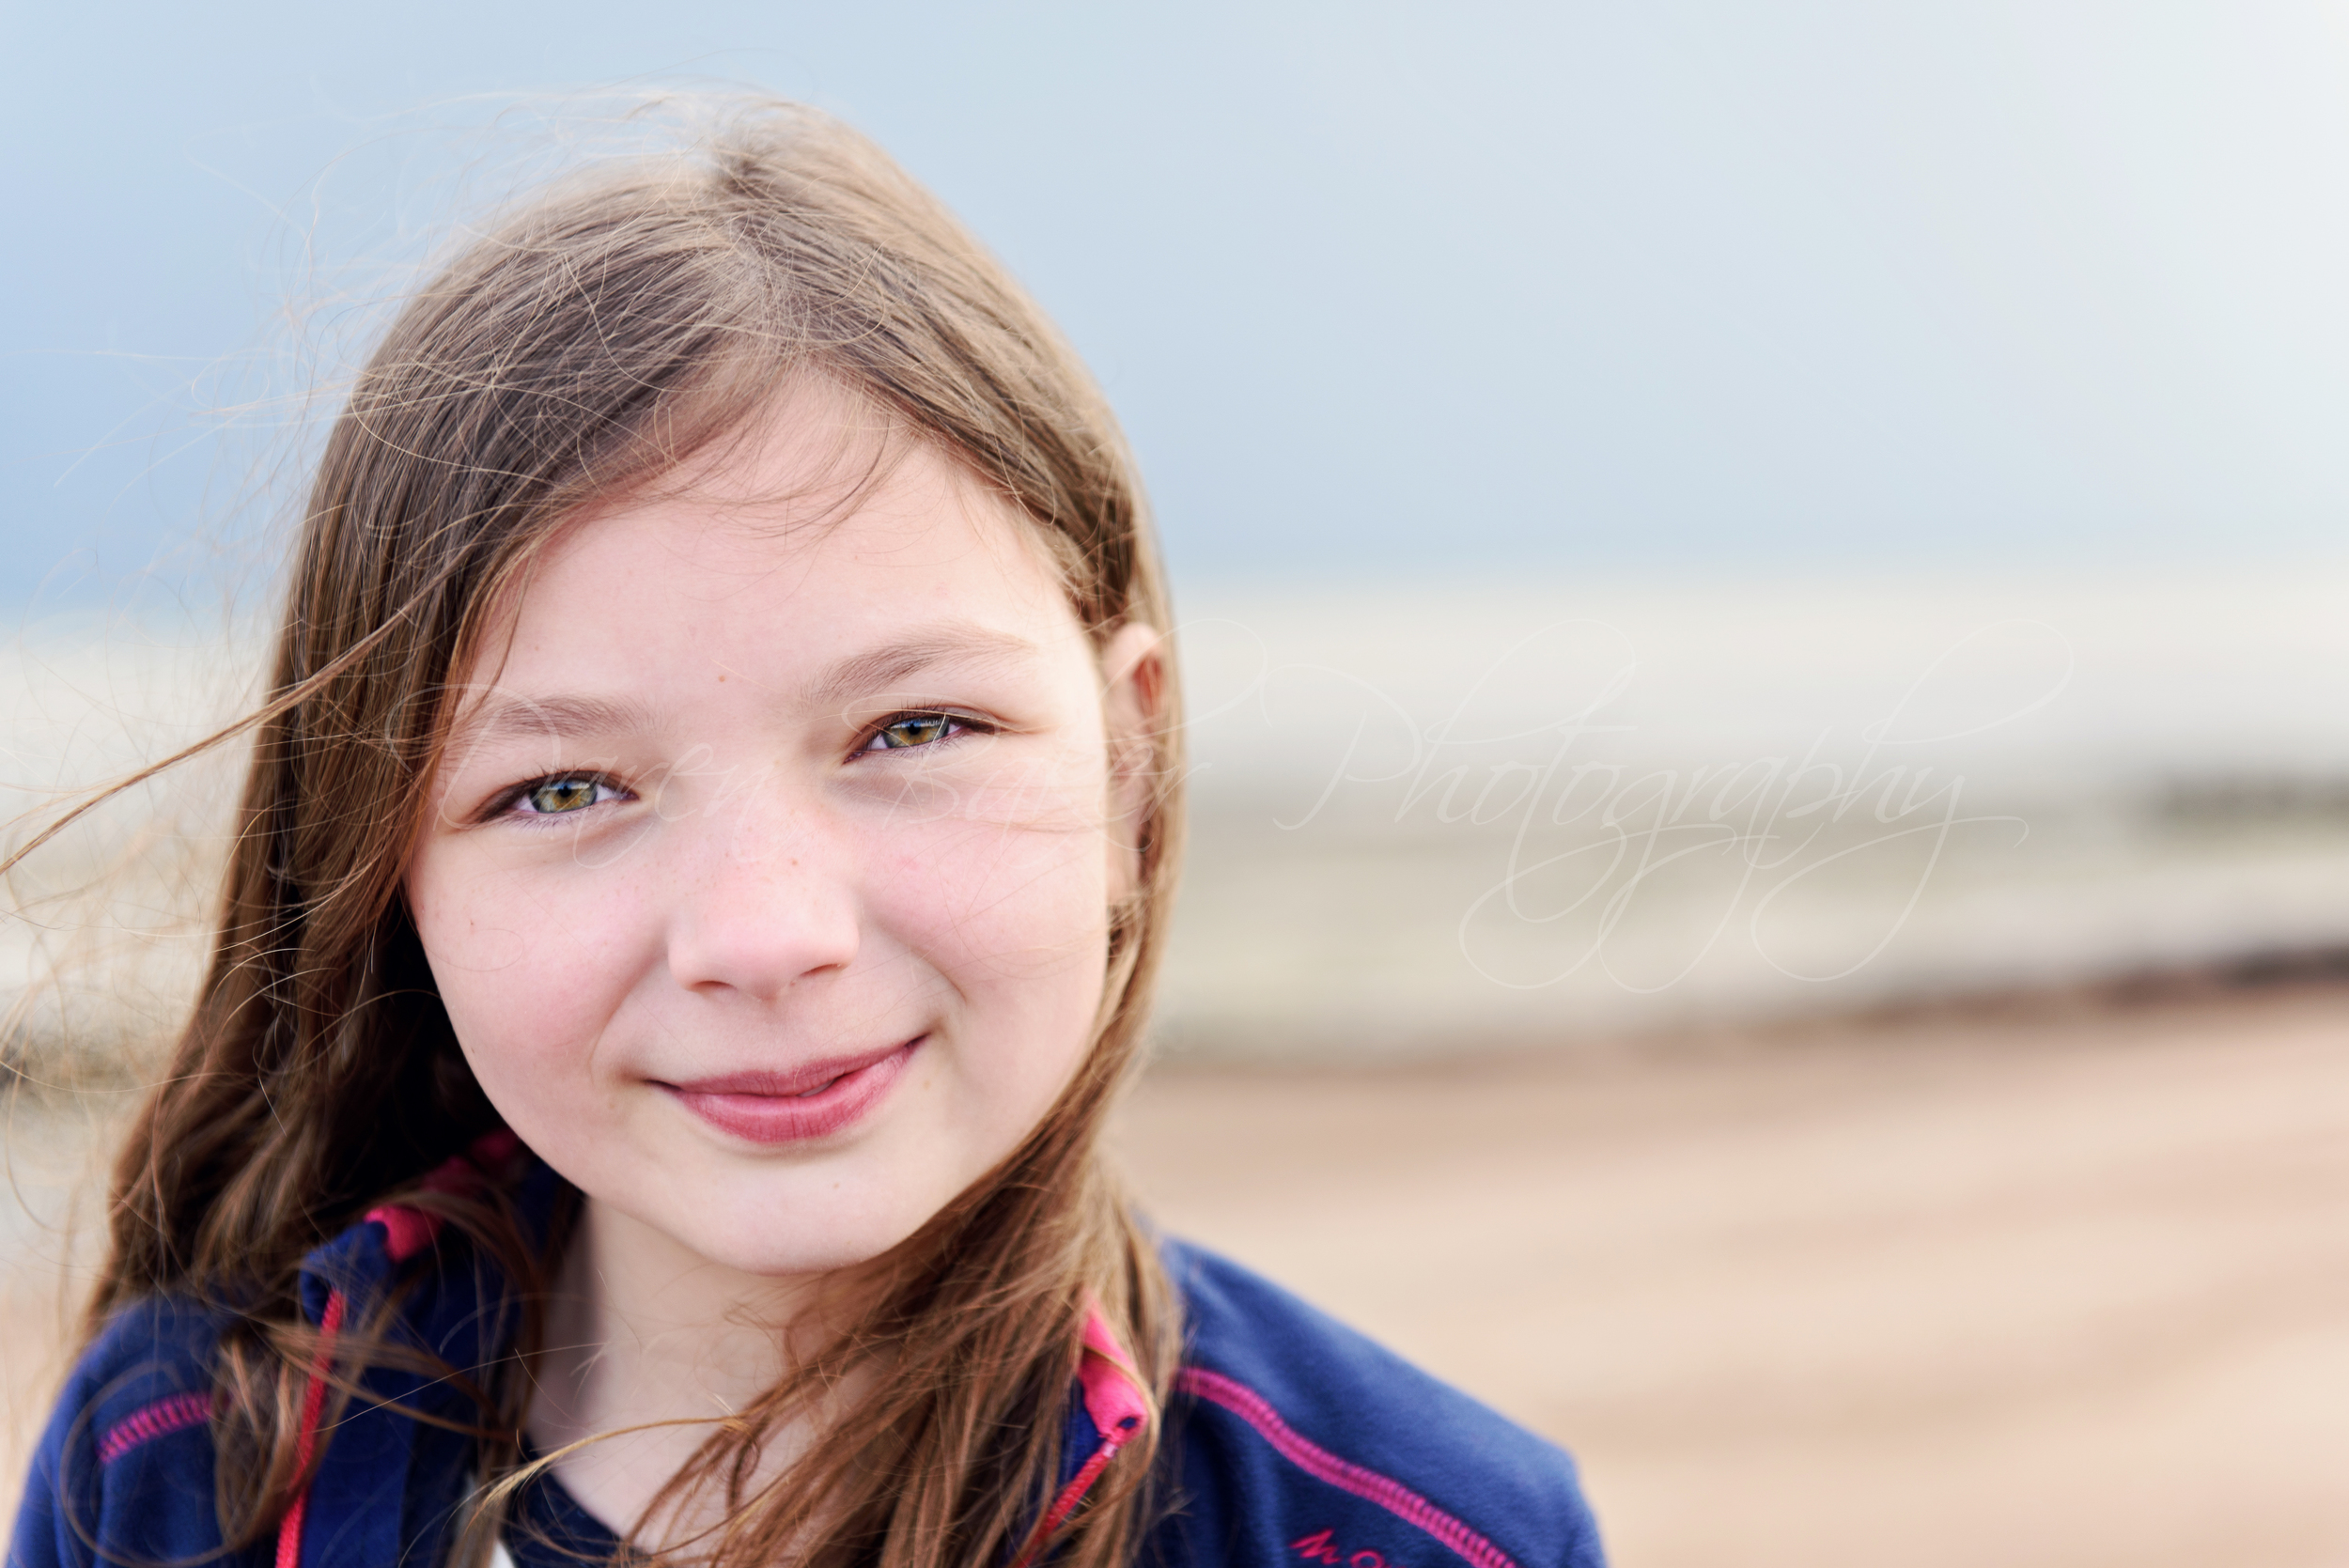 Child portrait, Ferring Beach Sussex